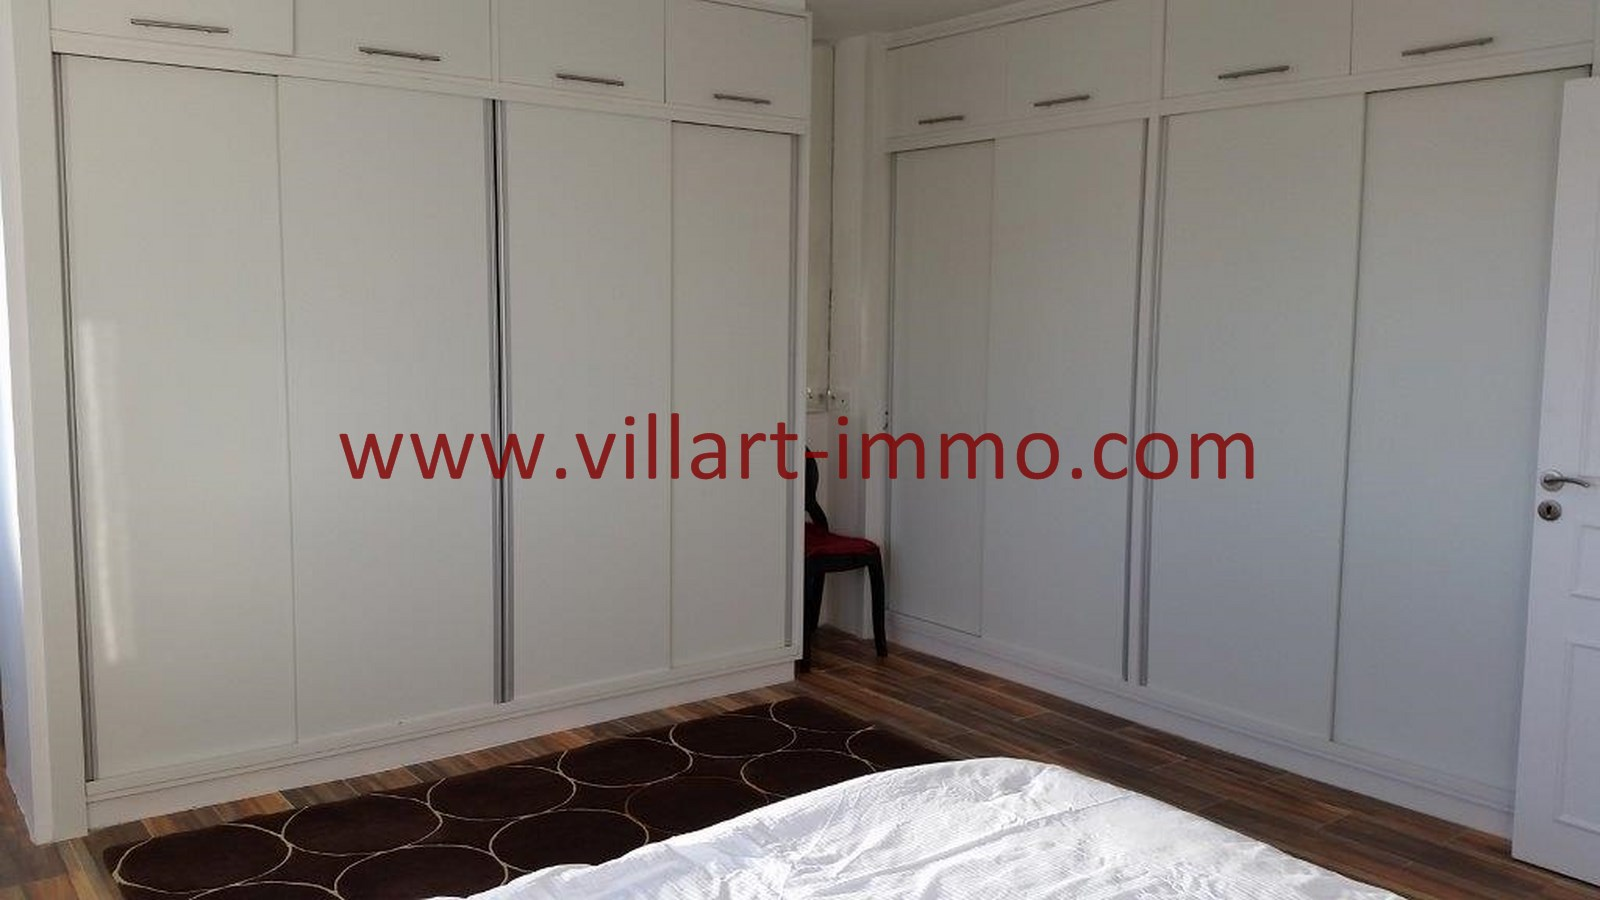 11-Vente-Appartement-Tanger-Centre-De-Ville-Chambre 3-VA518-Villart Immo